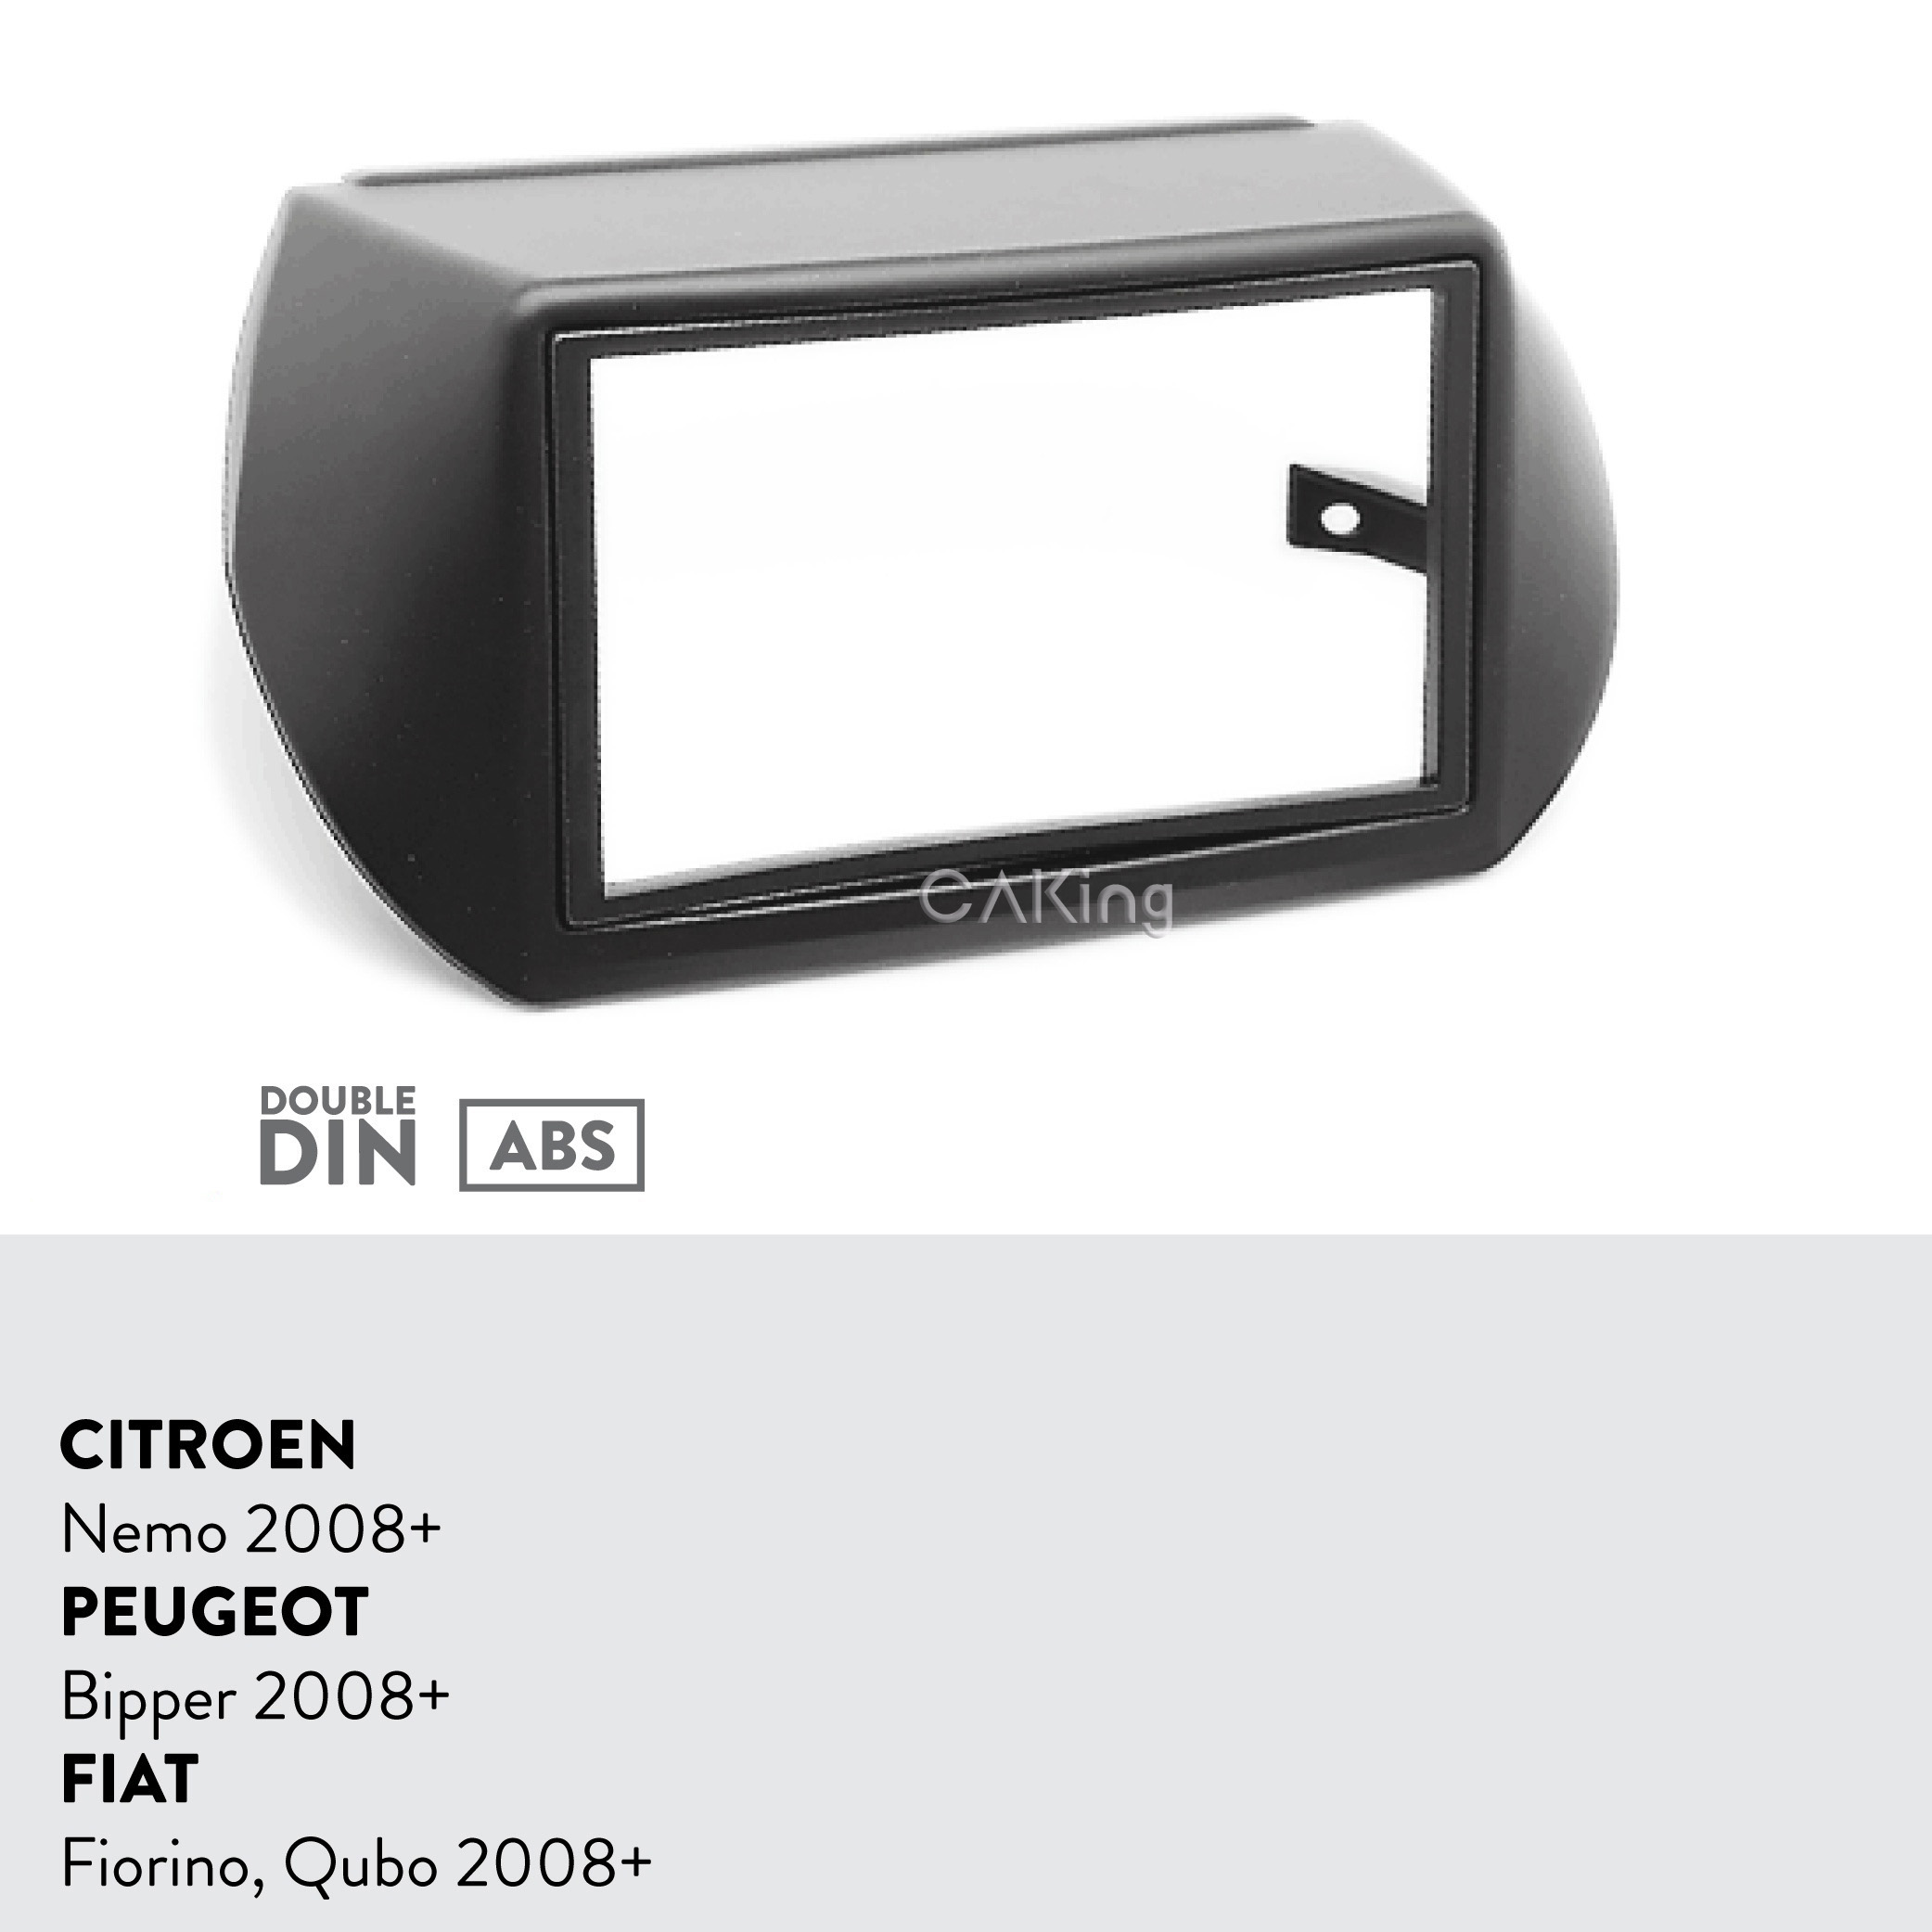 Double Din Car Fascia Radio Panel for CITROEN Nemo / PEUGEOT Bipper / FIAT Fiorino, Qubo 2008+ Dash Kit Adapter Facia Face Plate-in Fascias from Automobiles & Motorcycles    2